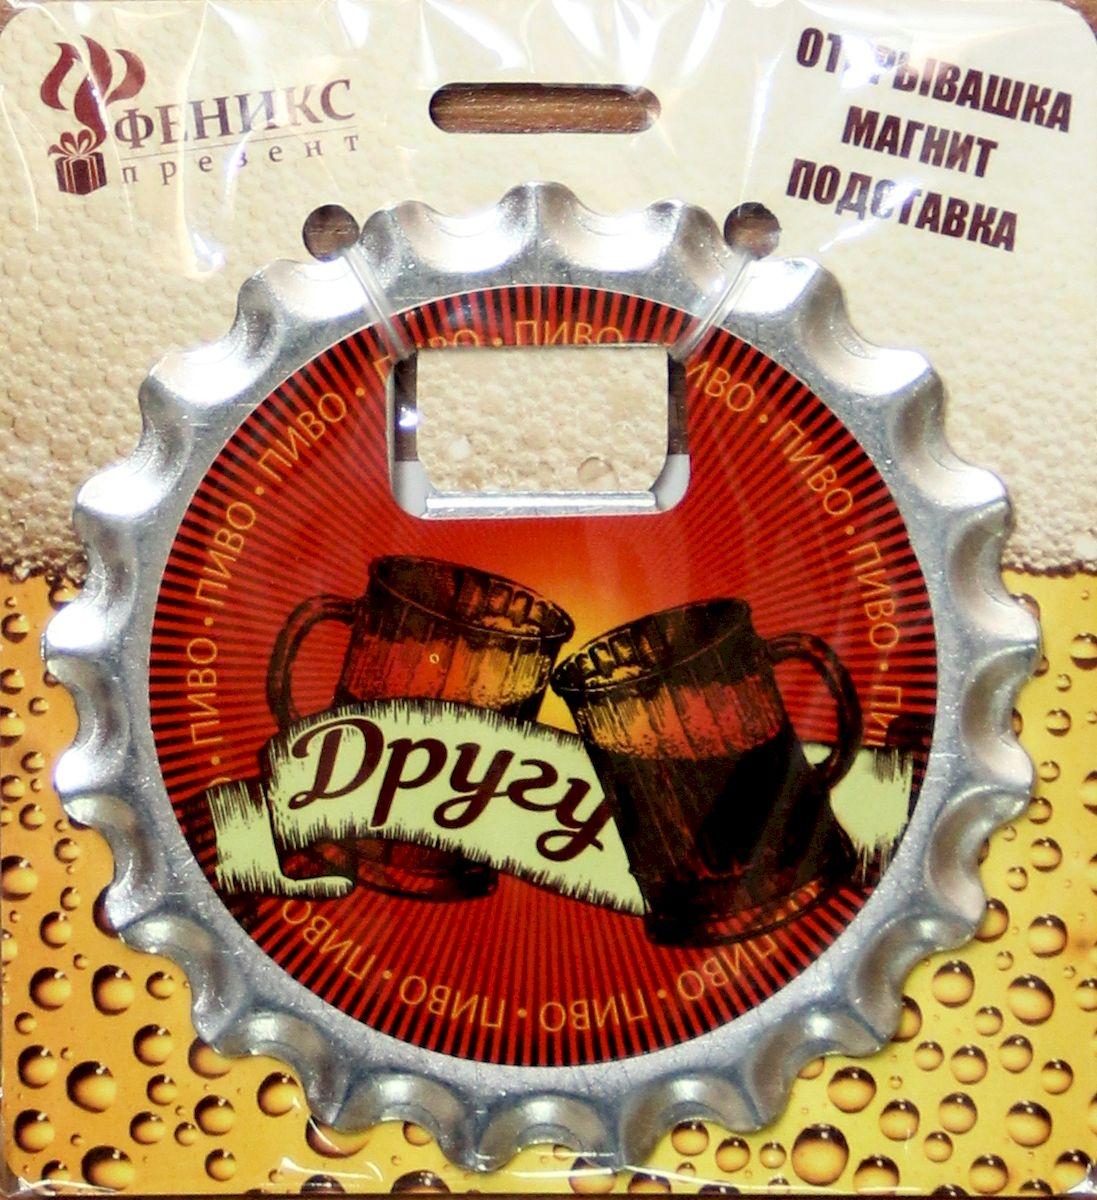 Ключ для открывания бутылок Magic Home Другу, с магнитом ключ для открывания бутылок magic home артем с магнитом